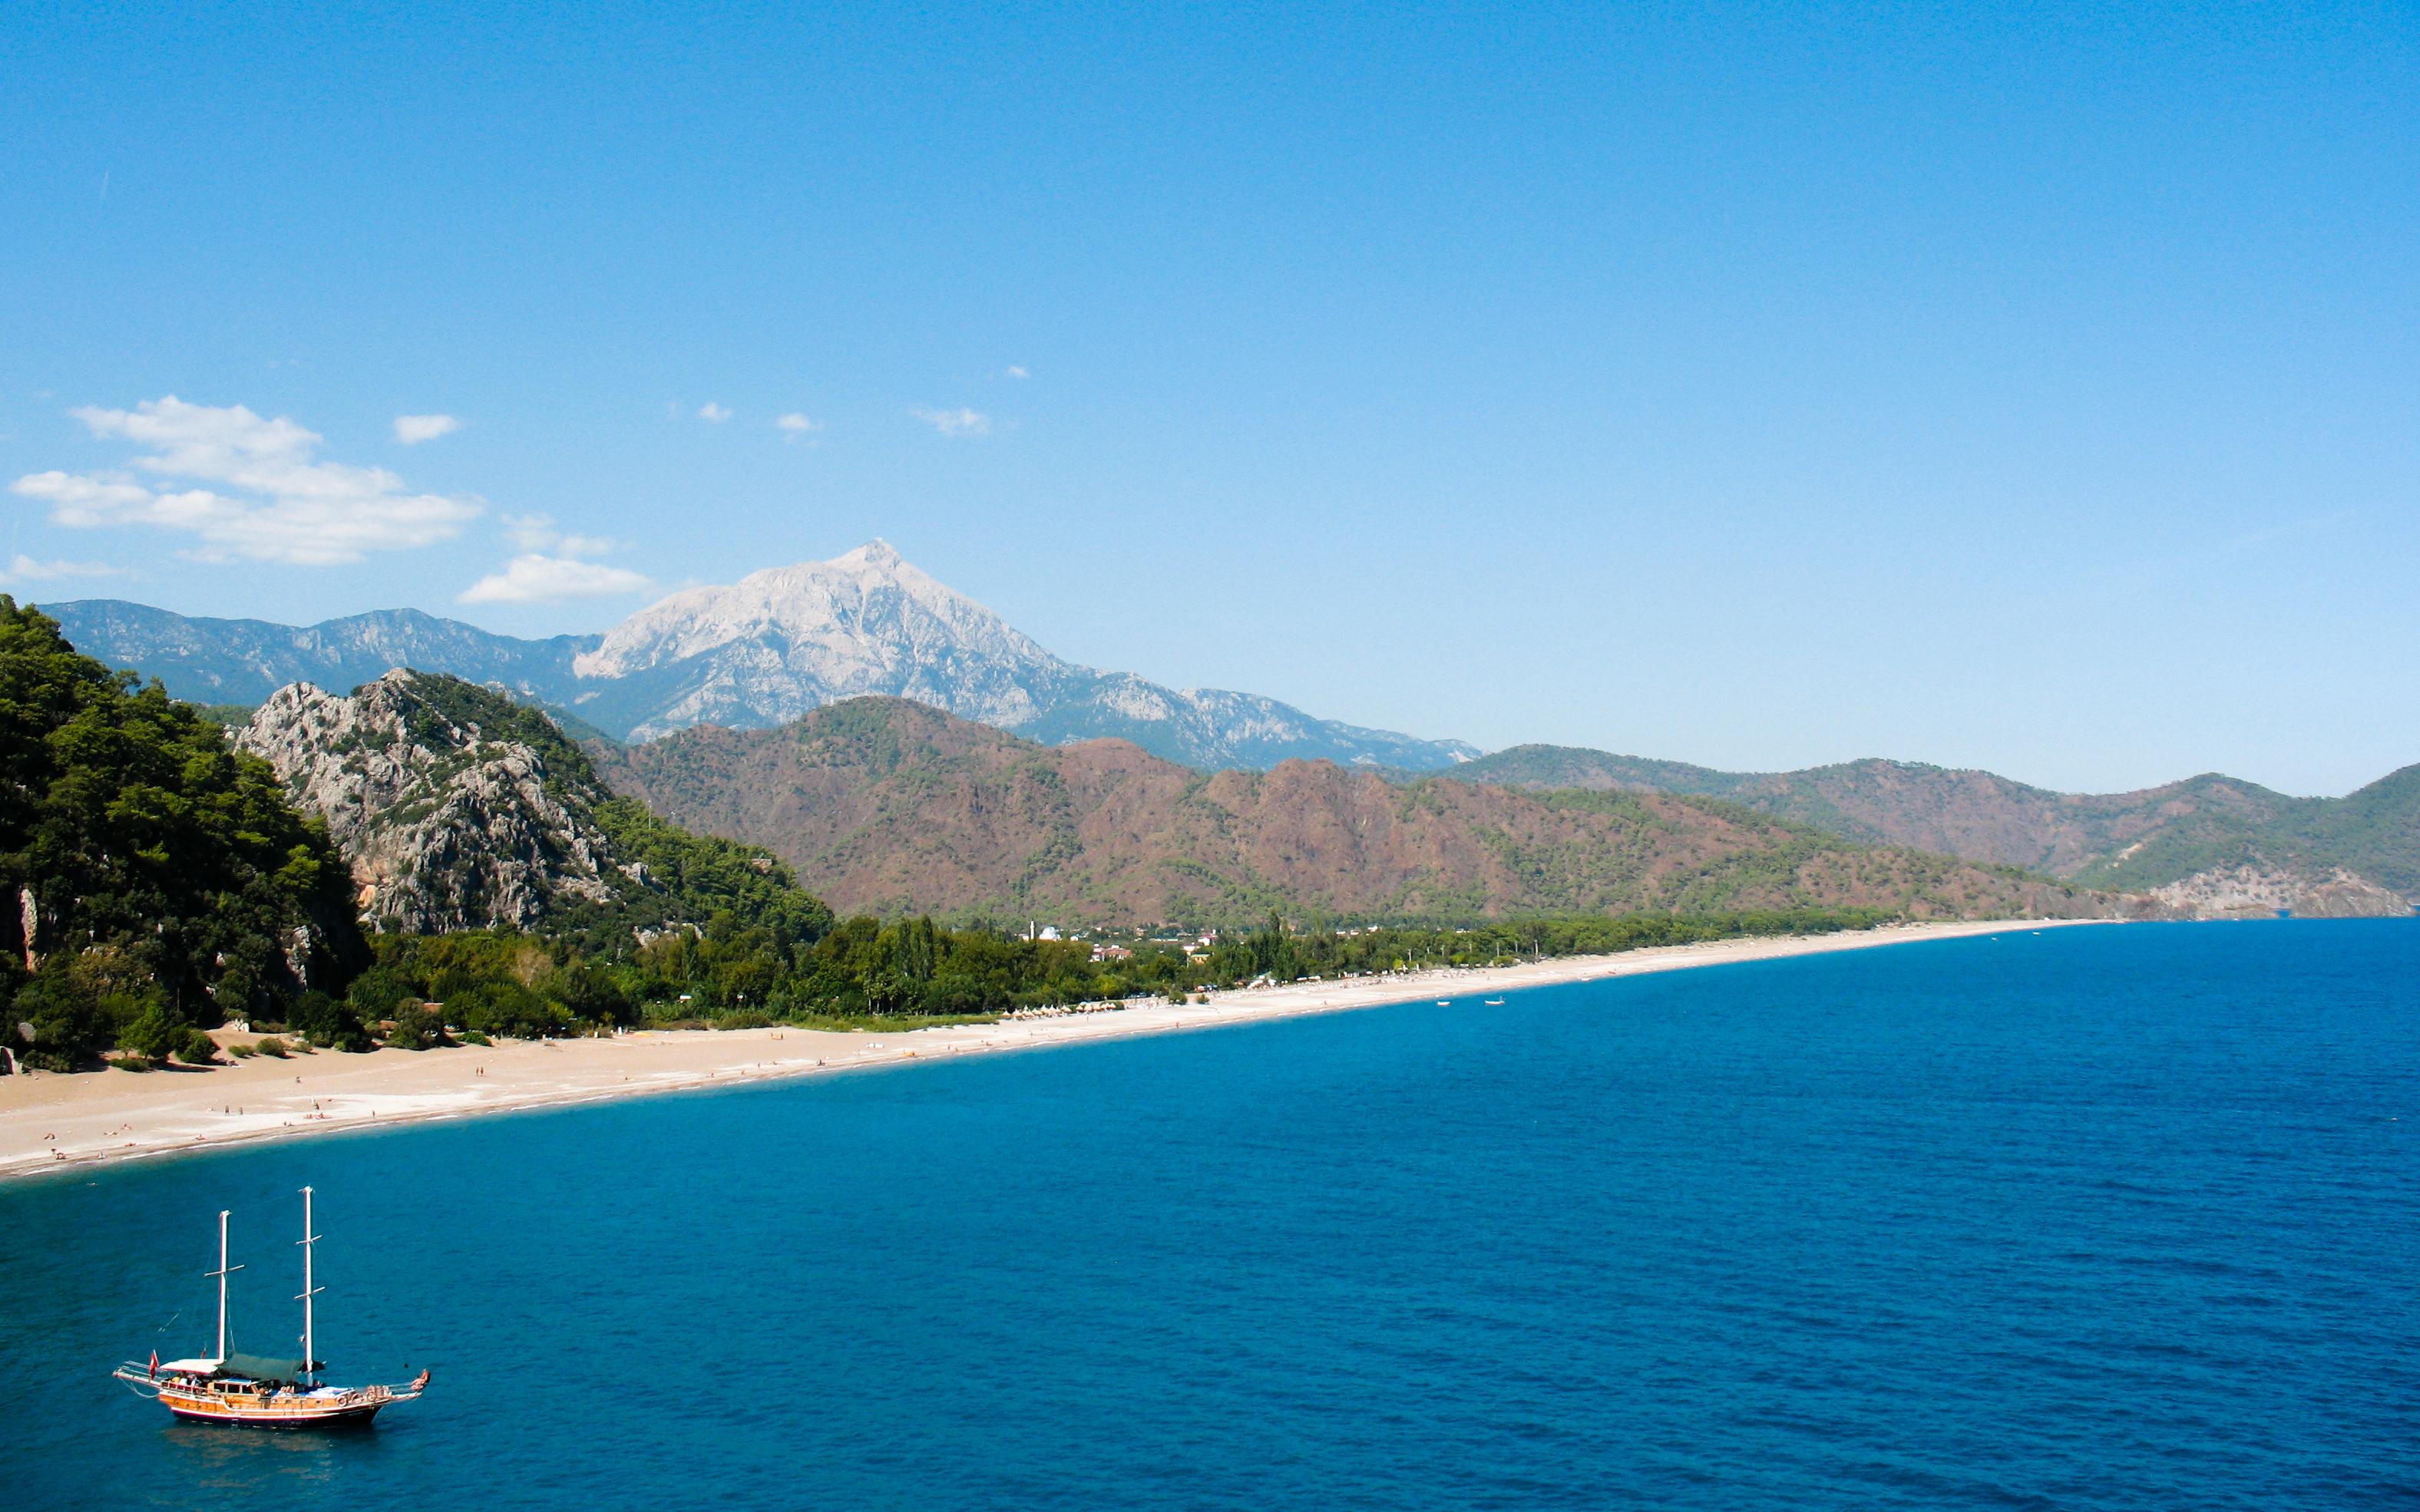 File:Olympos beach.jpg - Wikimedia Commons